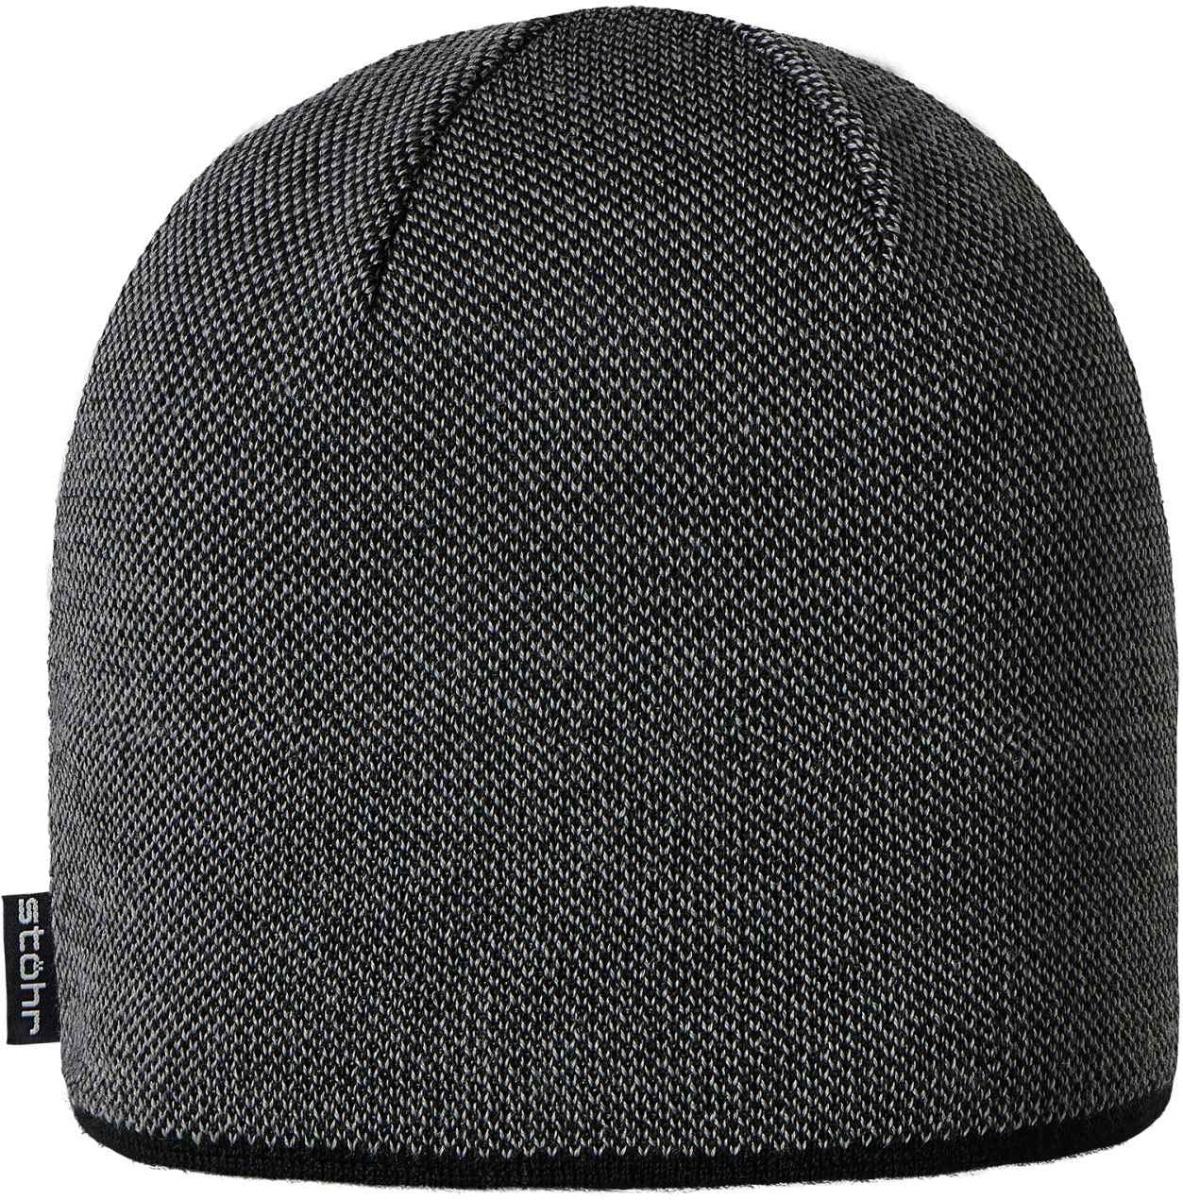 Stöhr Pius Mütze 21108 schwarz-grau